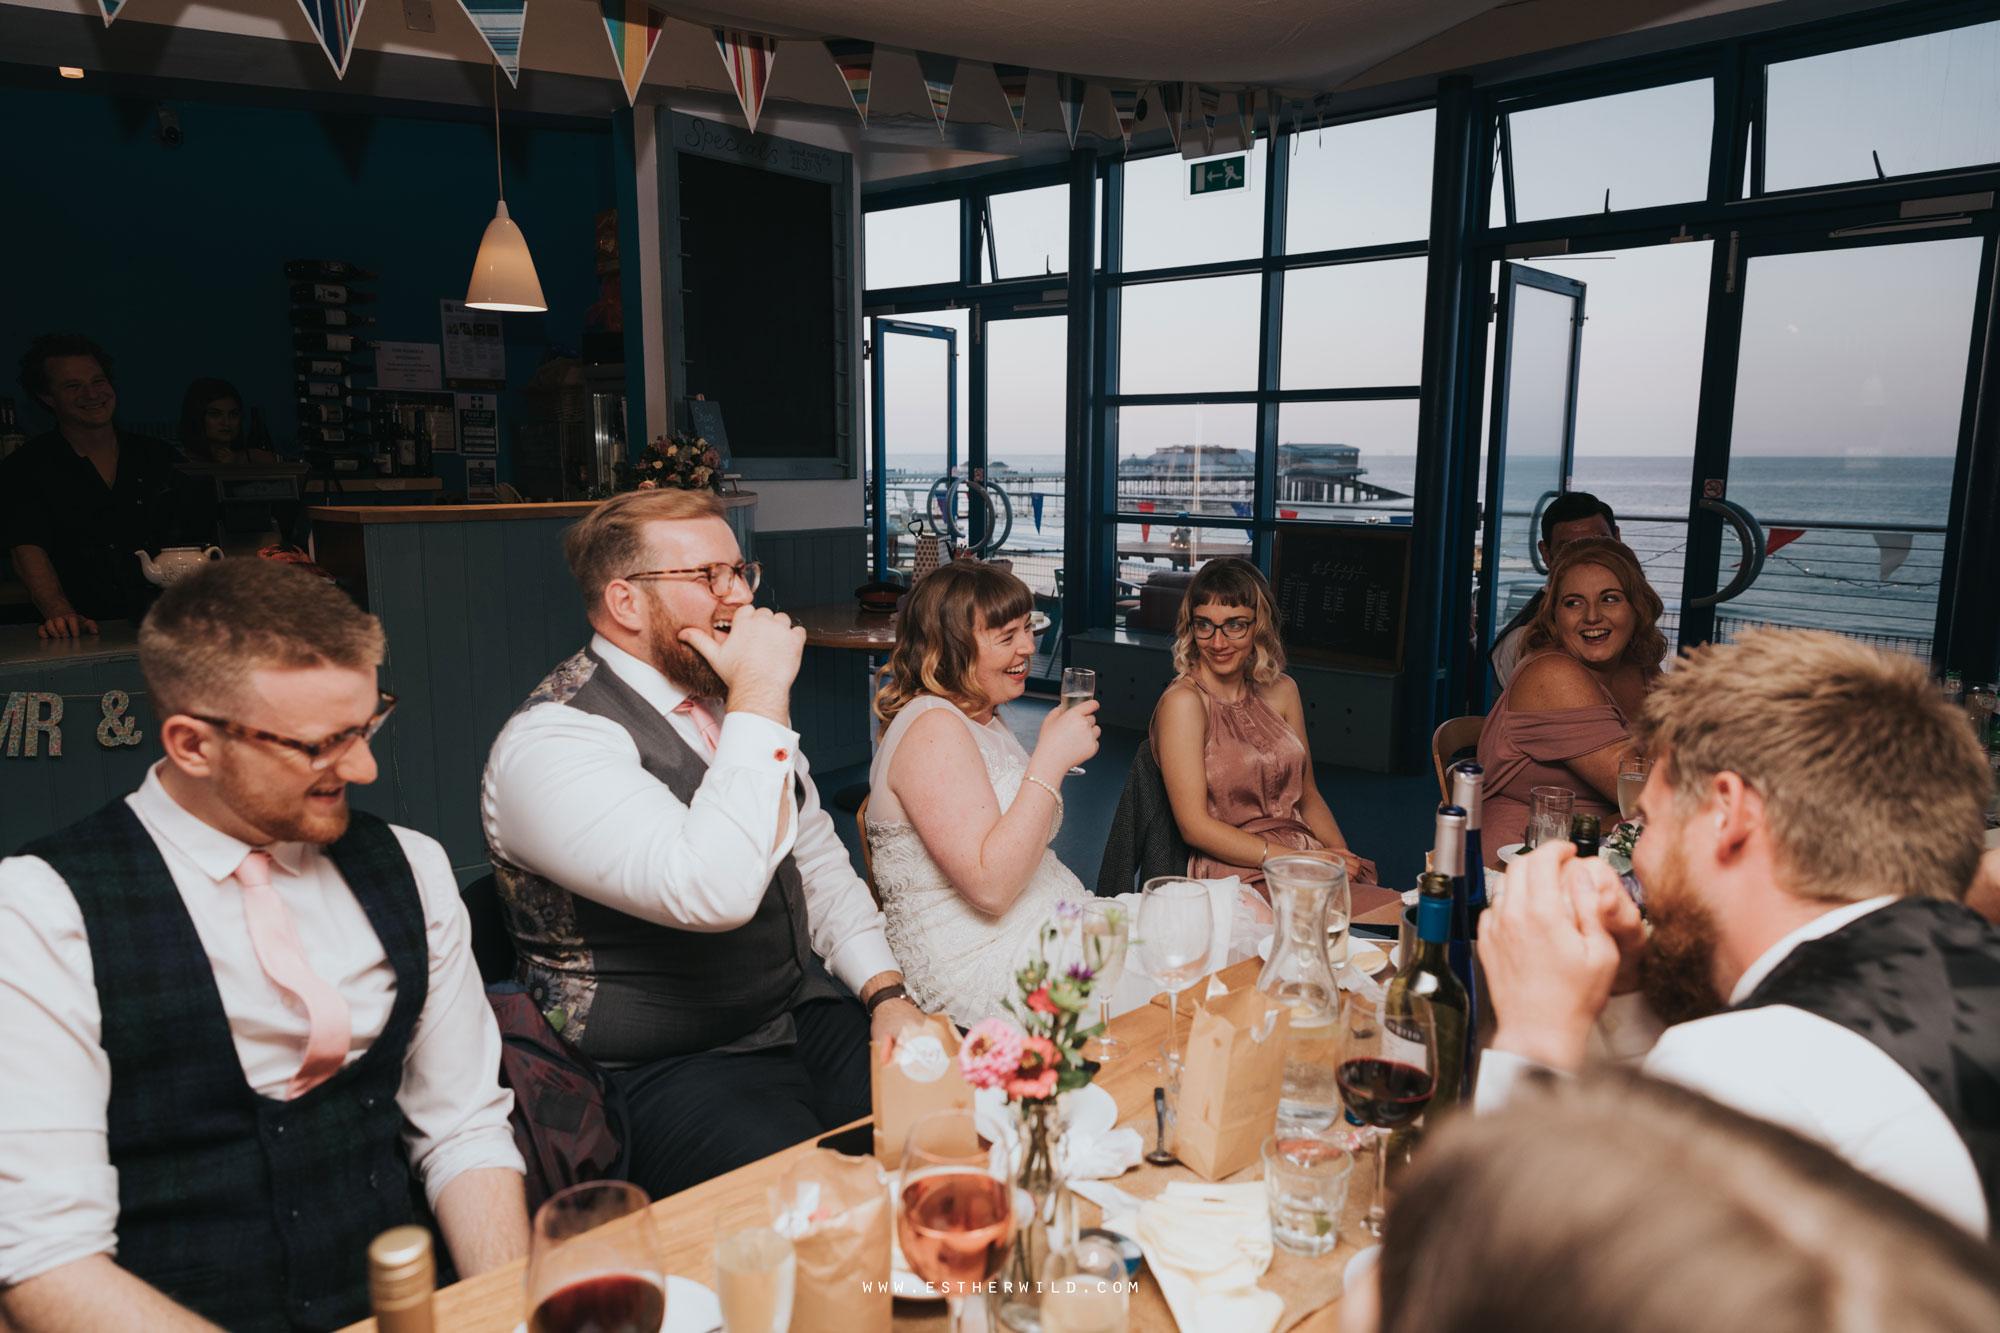 Cromer_Wedding_Beach_Outdoor_Ceremony_Norfolk_North_Lodge_Registry_Office_Rocket_House_Cafe_Cromer_Pier_IMG_5197.jpg